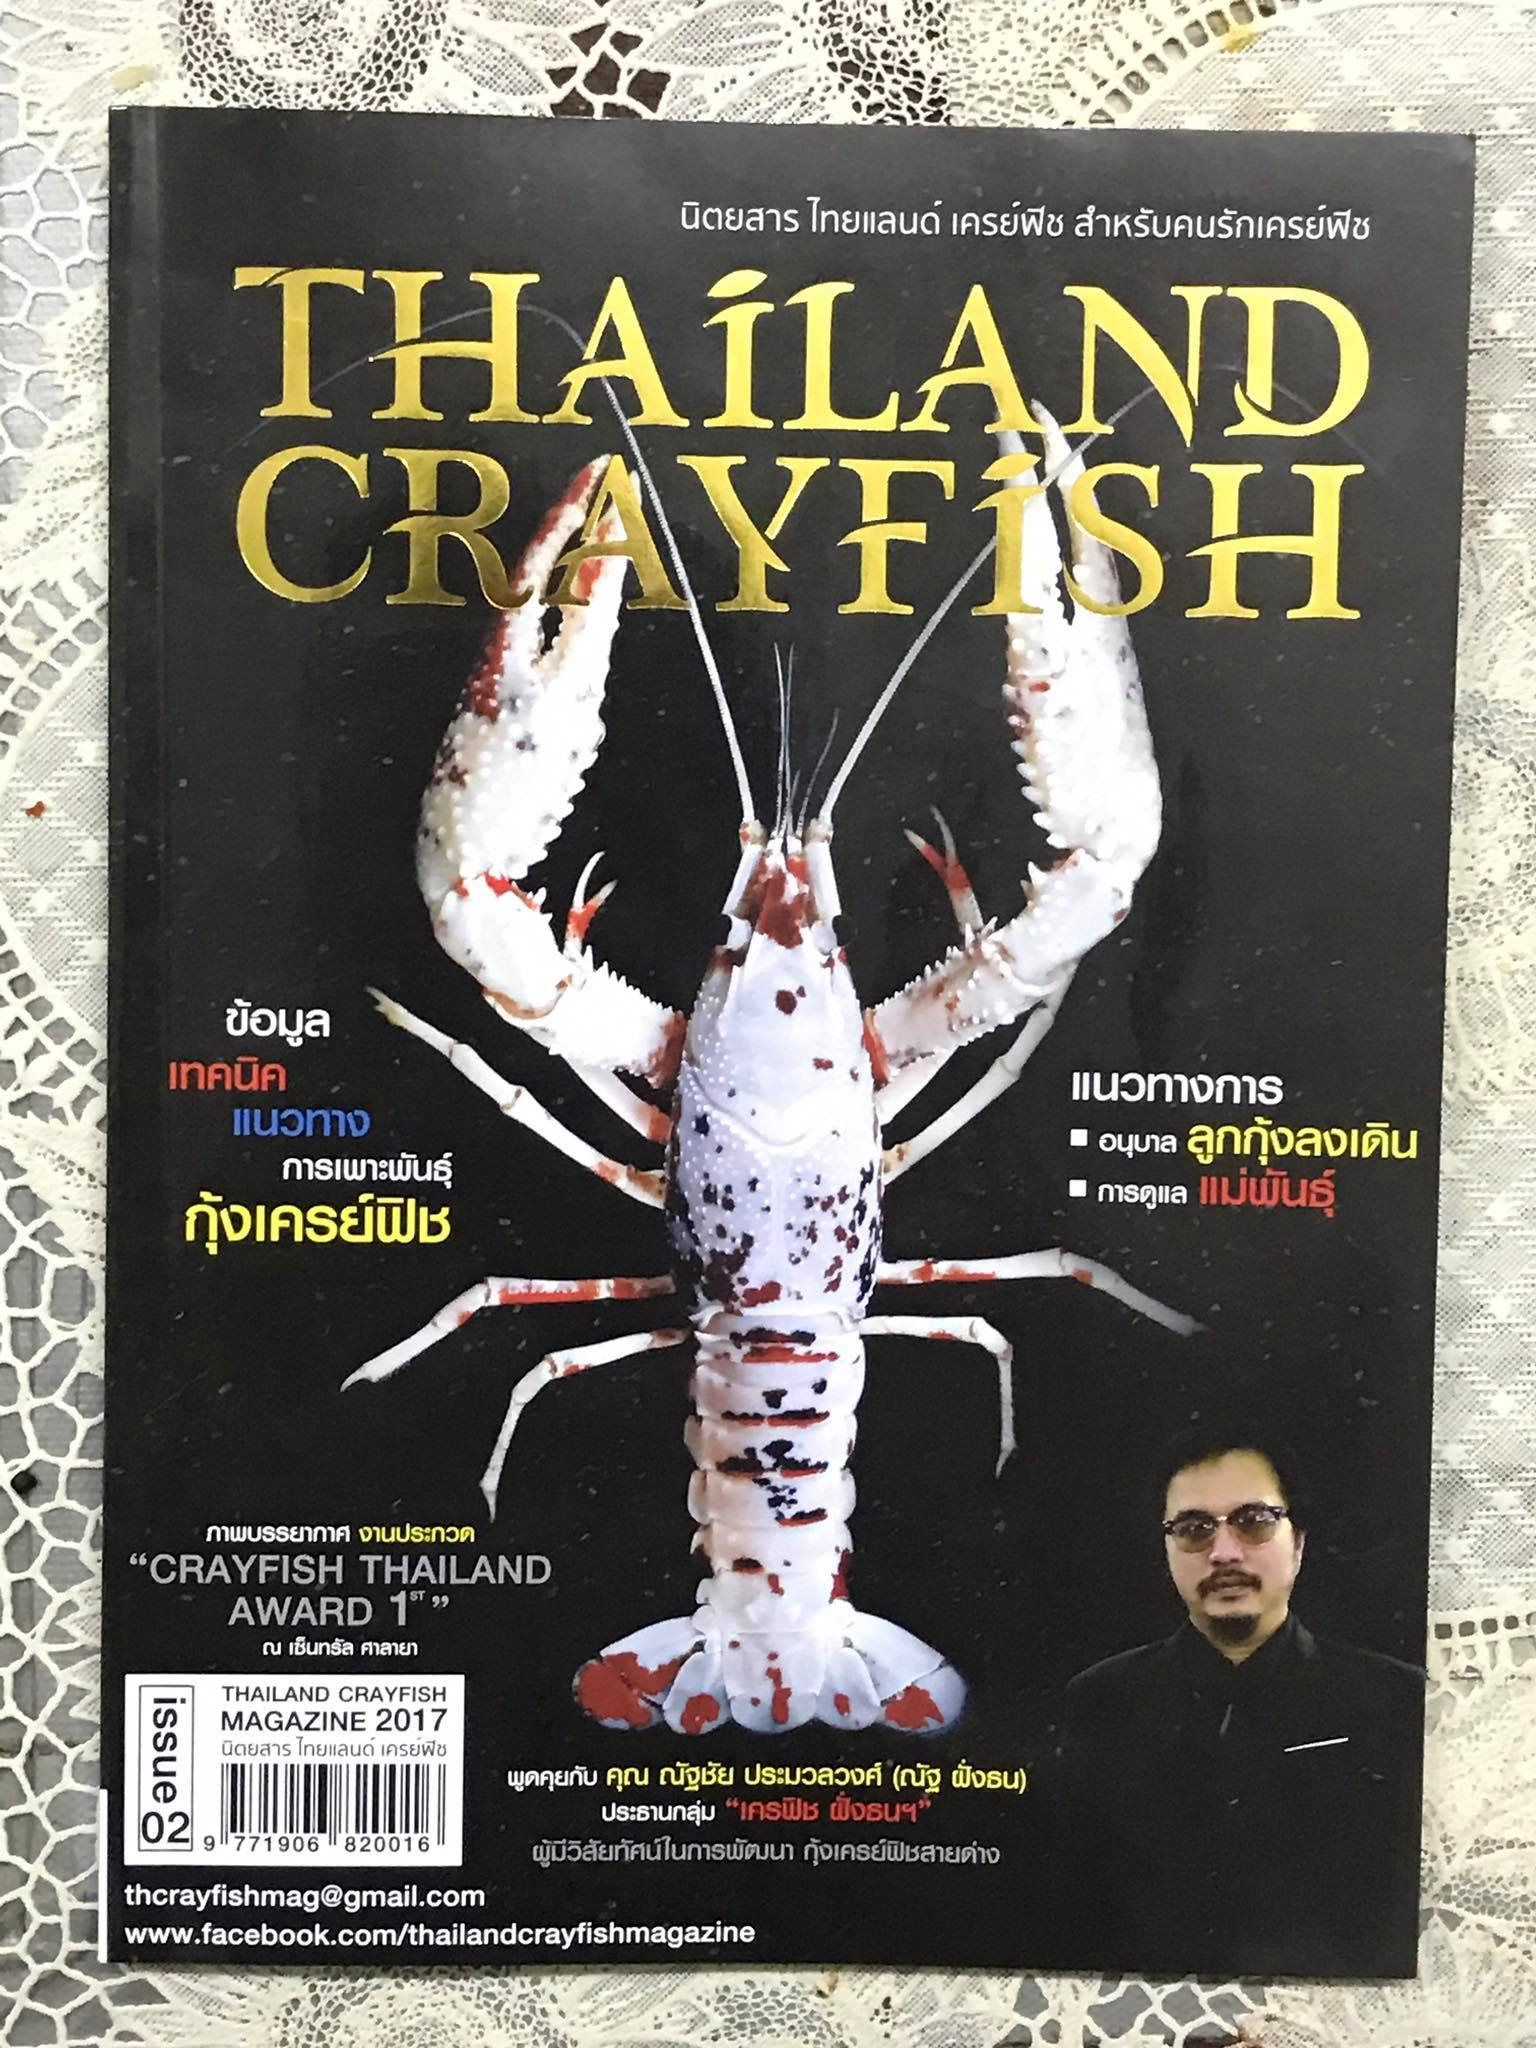 Thailand Crayfish Magazine Issue 2